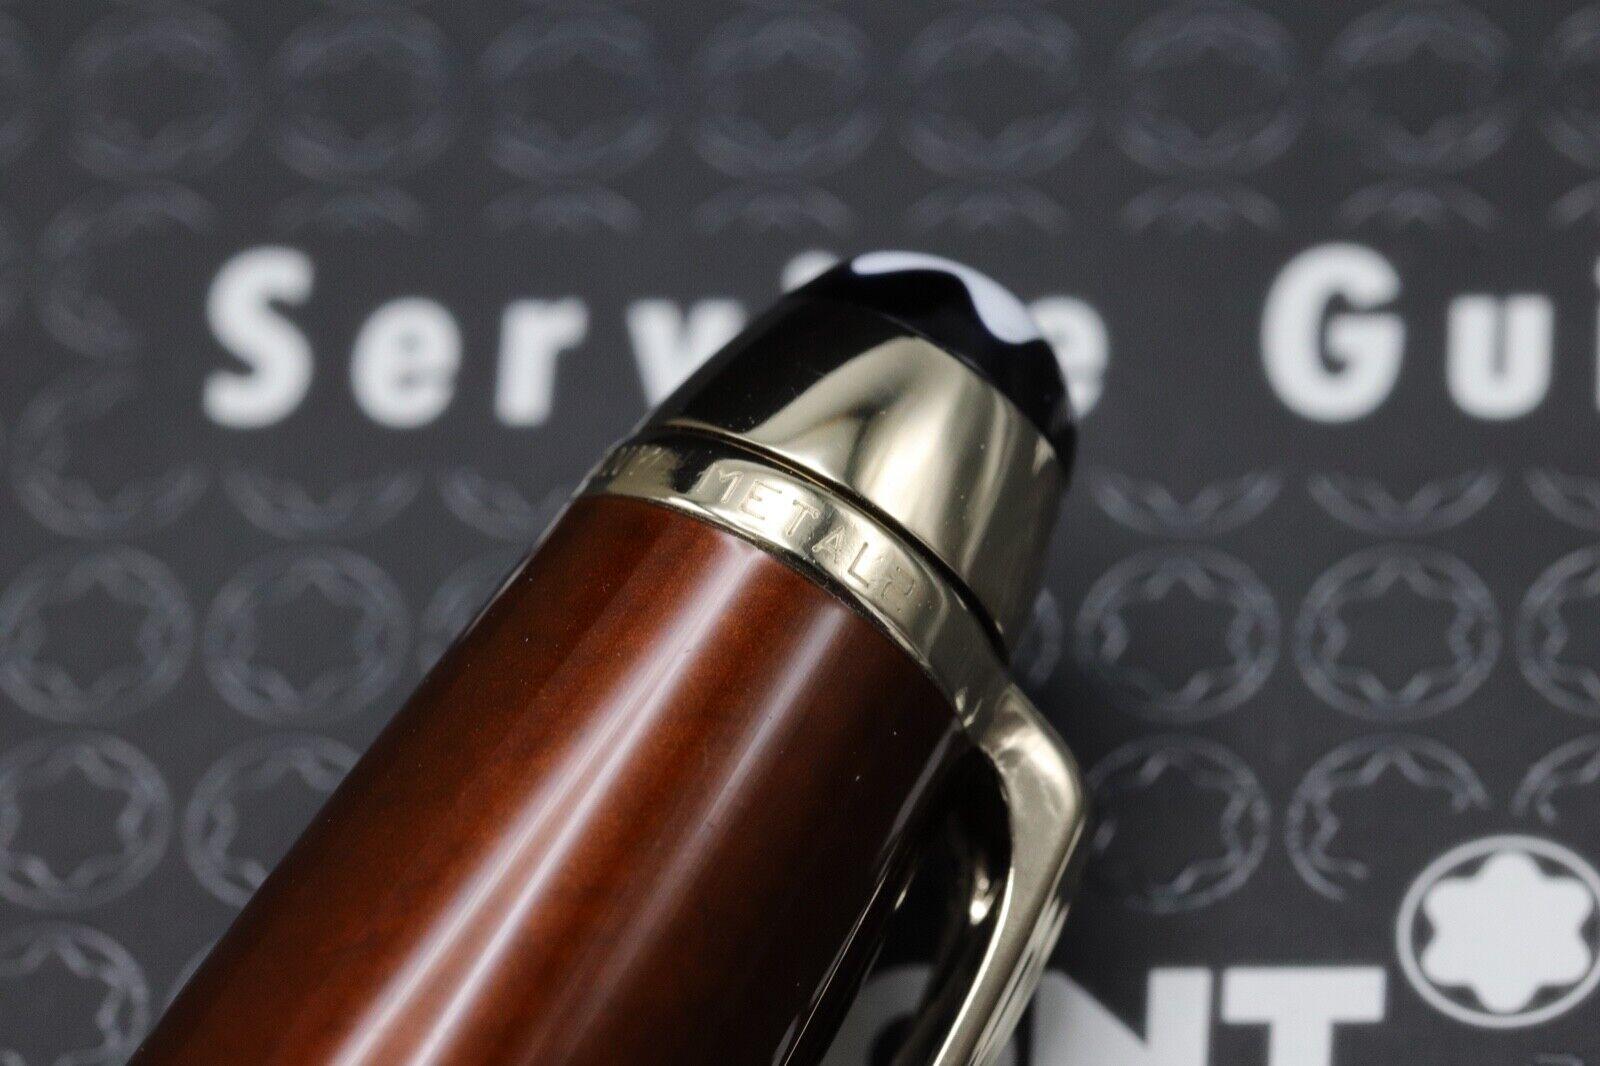 Montblanc Meisterstuck 163 Classique Solitaire Citrine Rollerball Pen 4